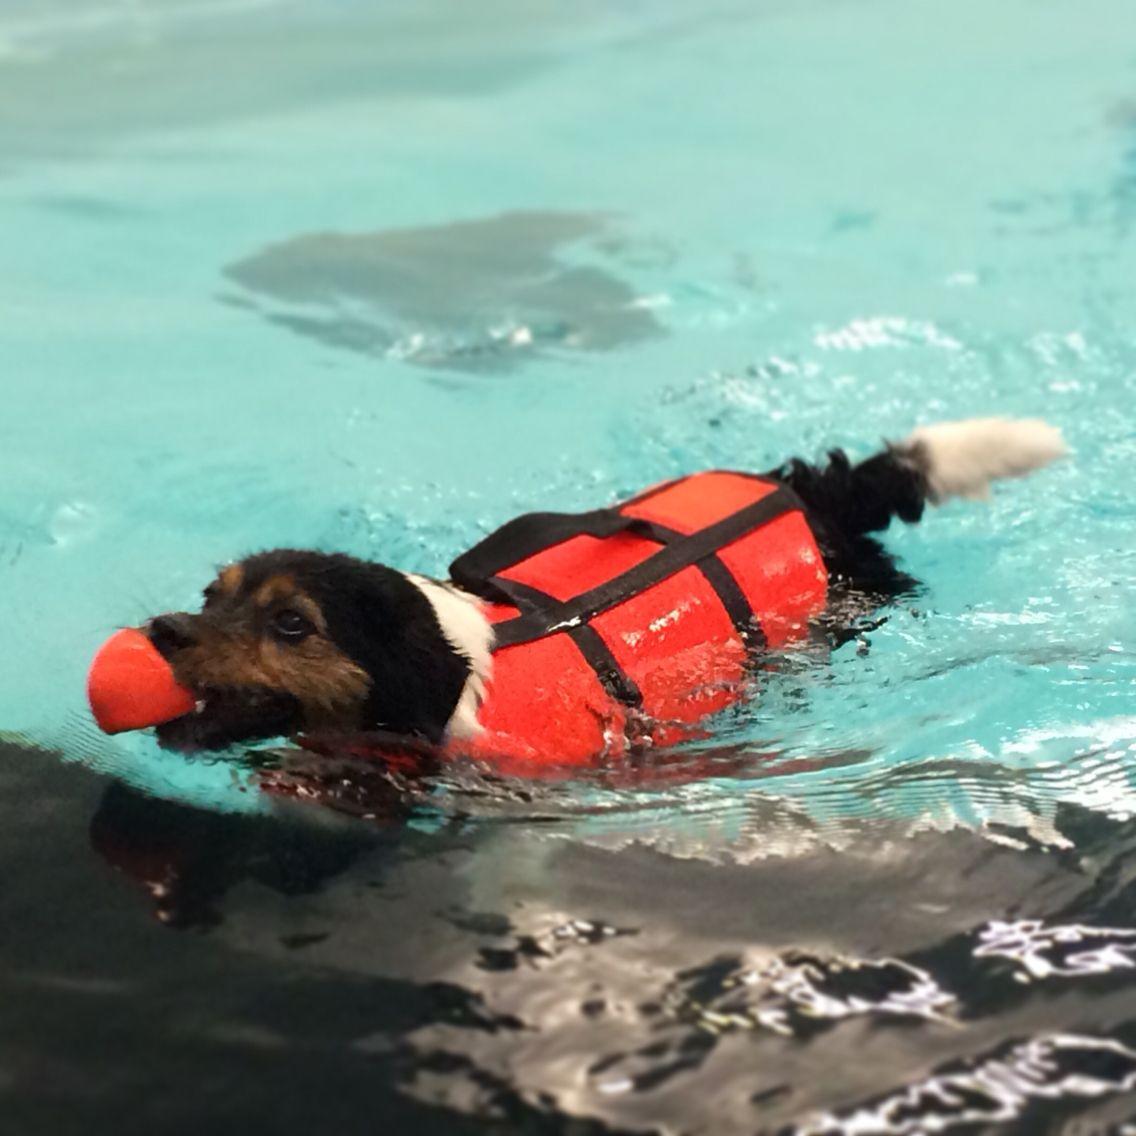 Telma uimassa koirauimalassa.